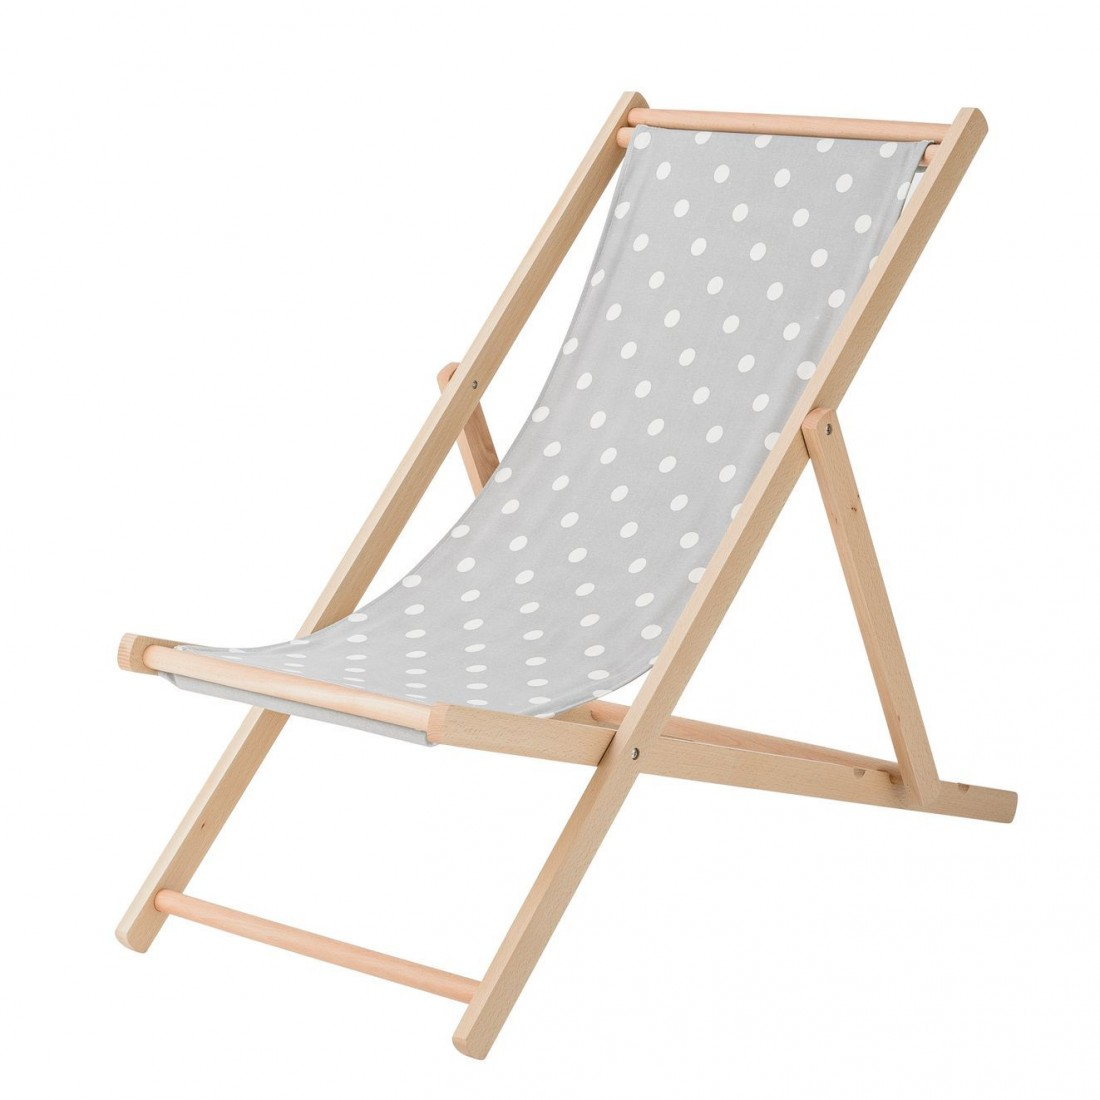 Chaise longue Bloomingville